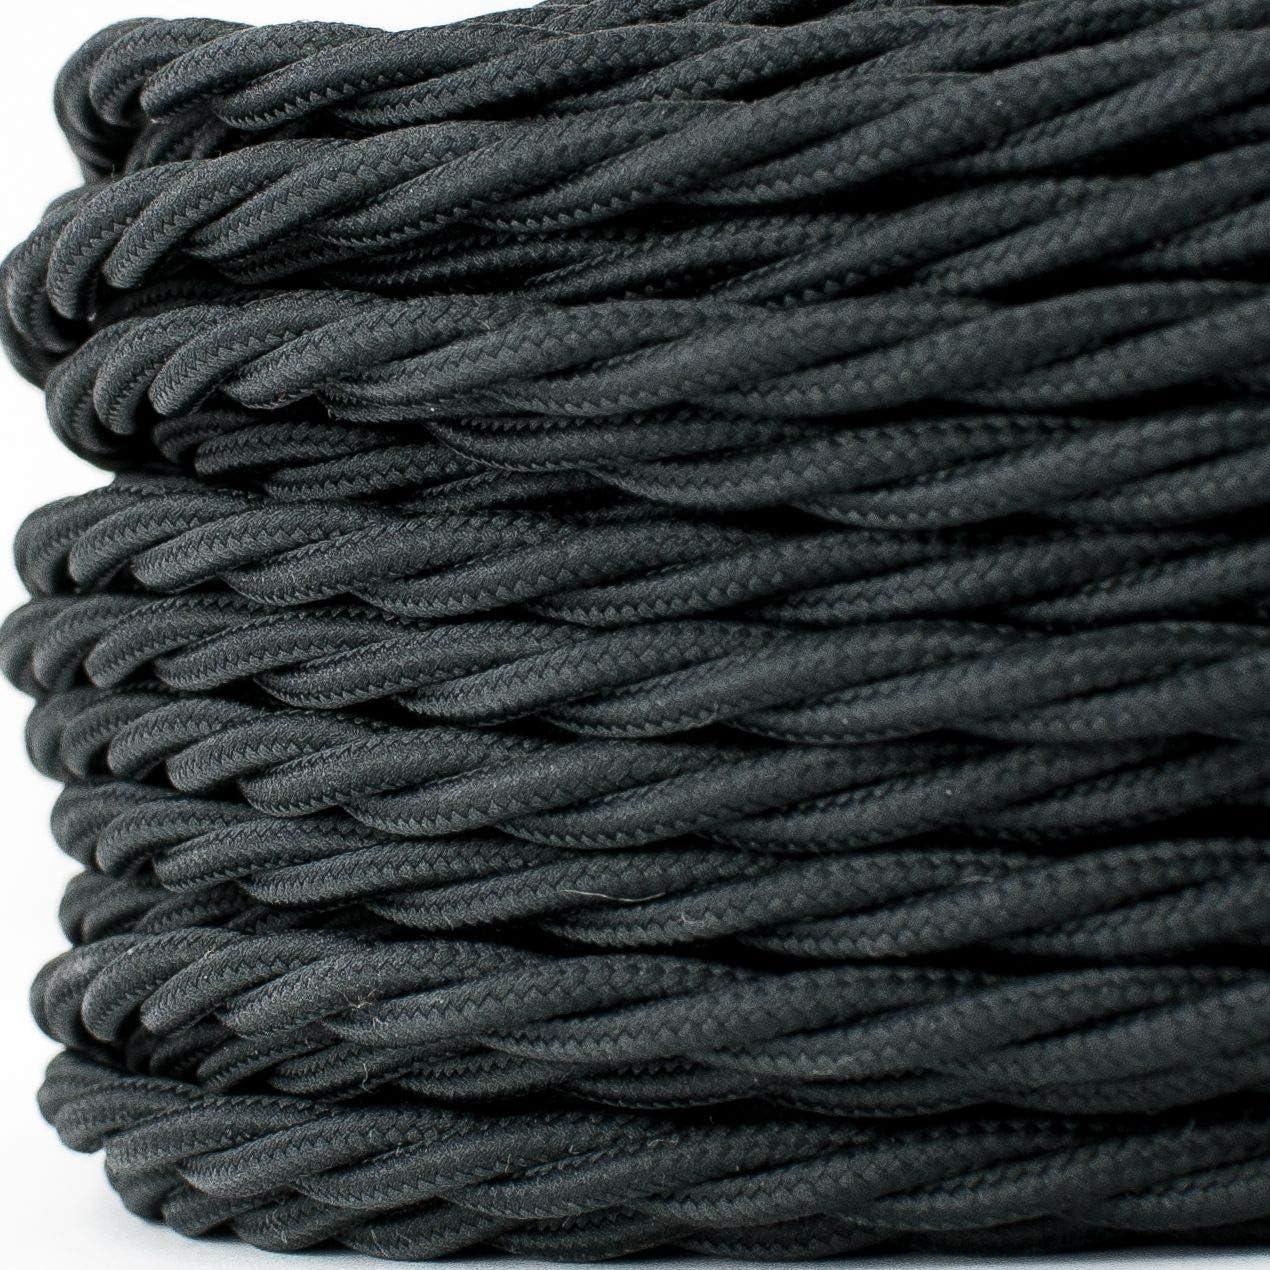 5//10//20m Textilkabel Lampen Stoffkabel Elektro-kabel 2-adrig Verseilt Geflochten